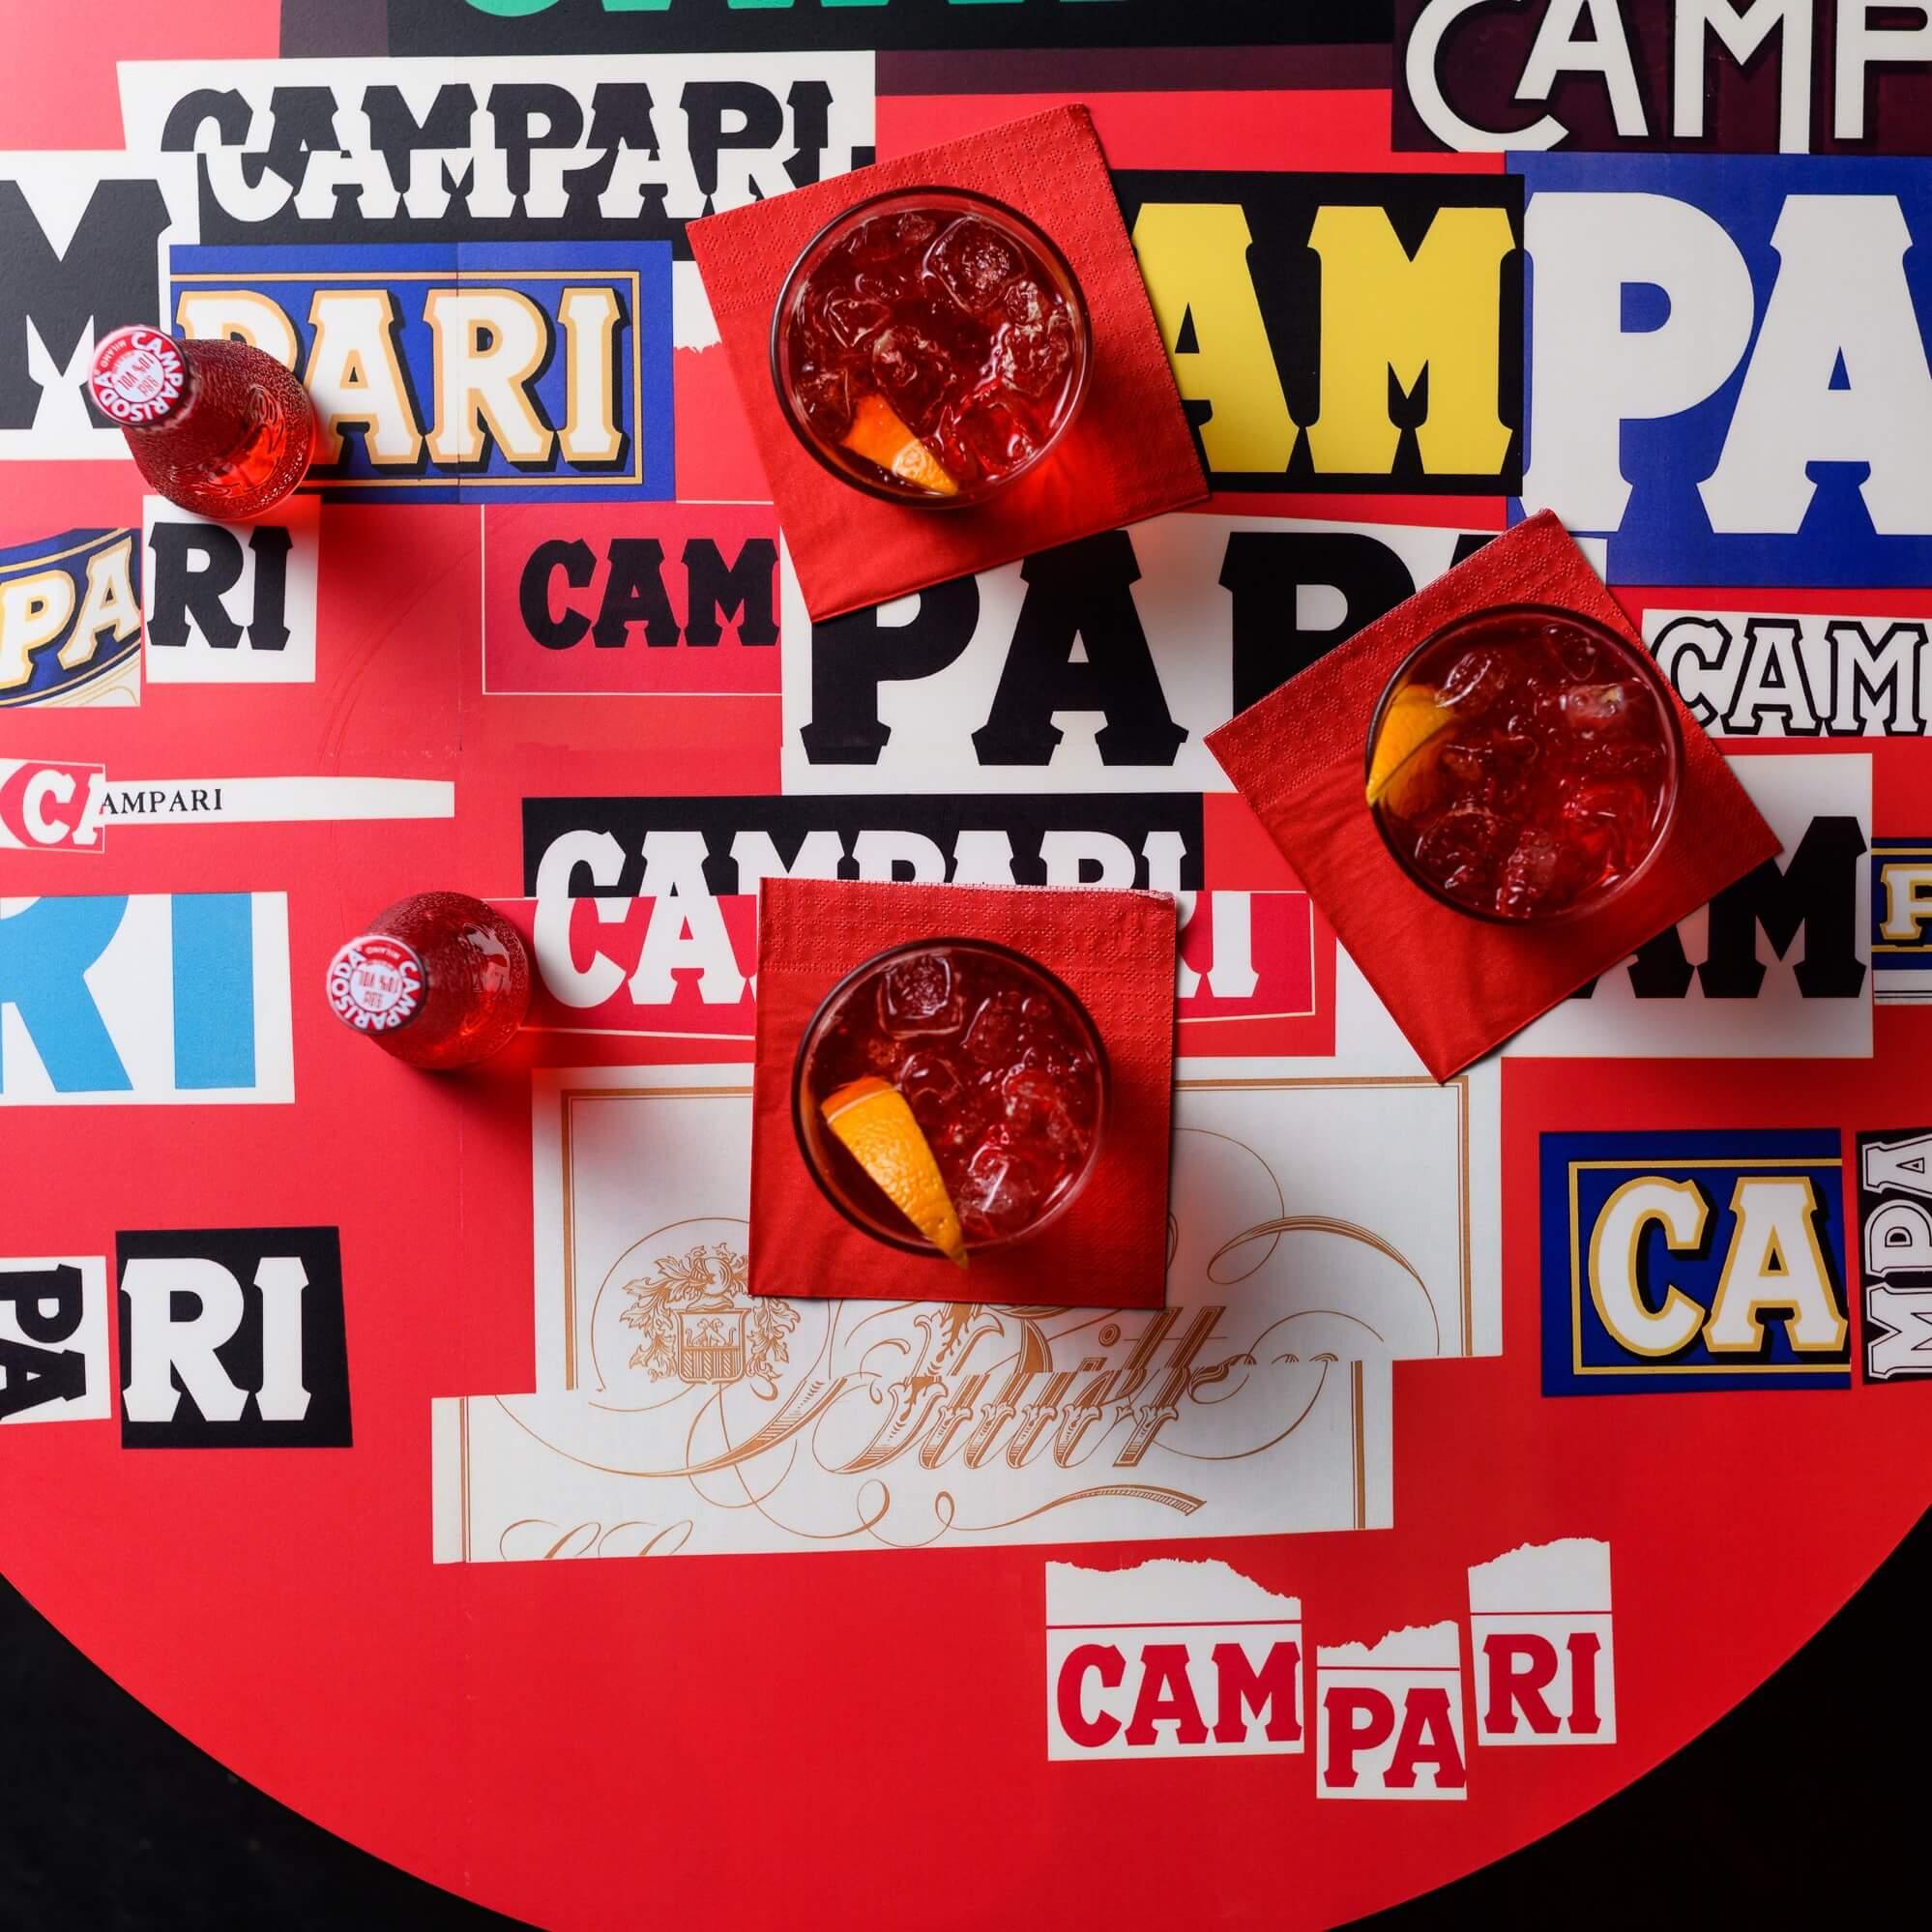 camparisodaart4square